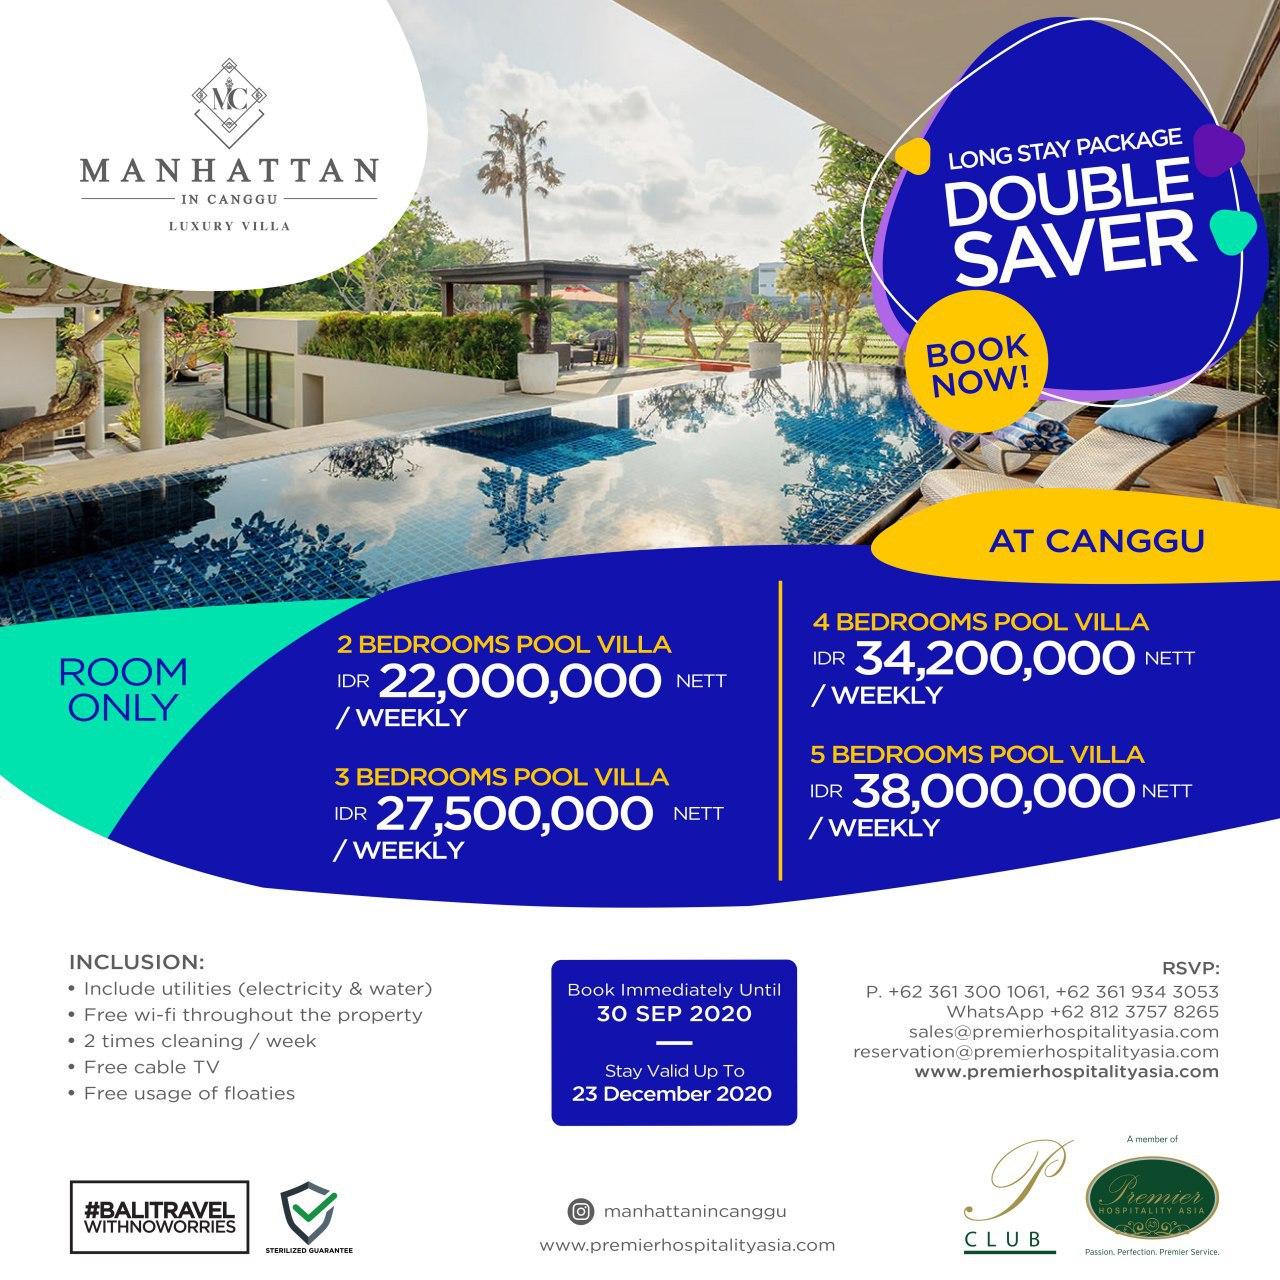 manhattan-in-canggu-luxury-wedding-villa-bali-5-bedroom-long-stay-weekly-rental